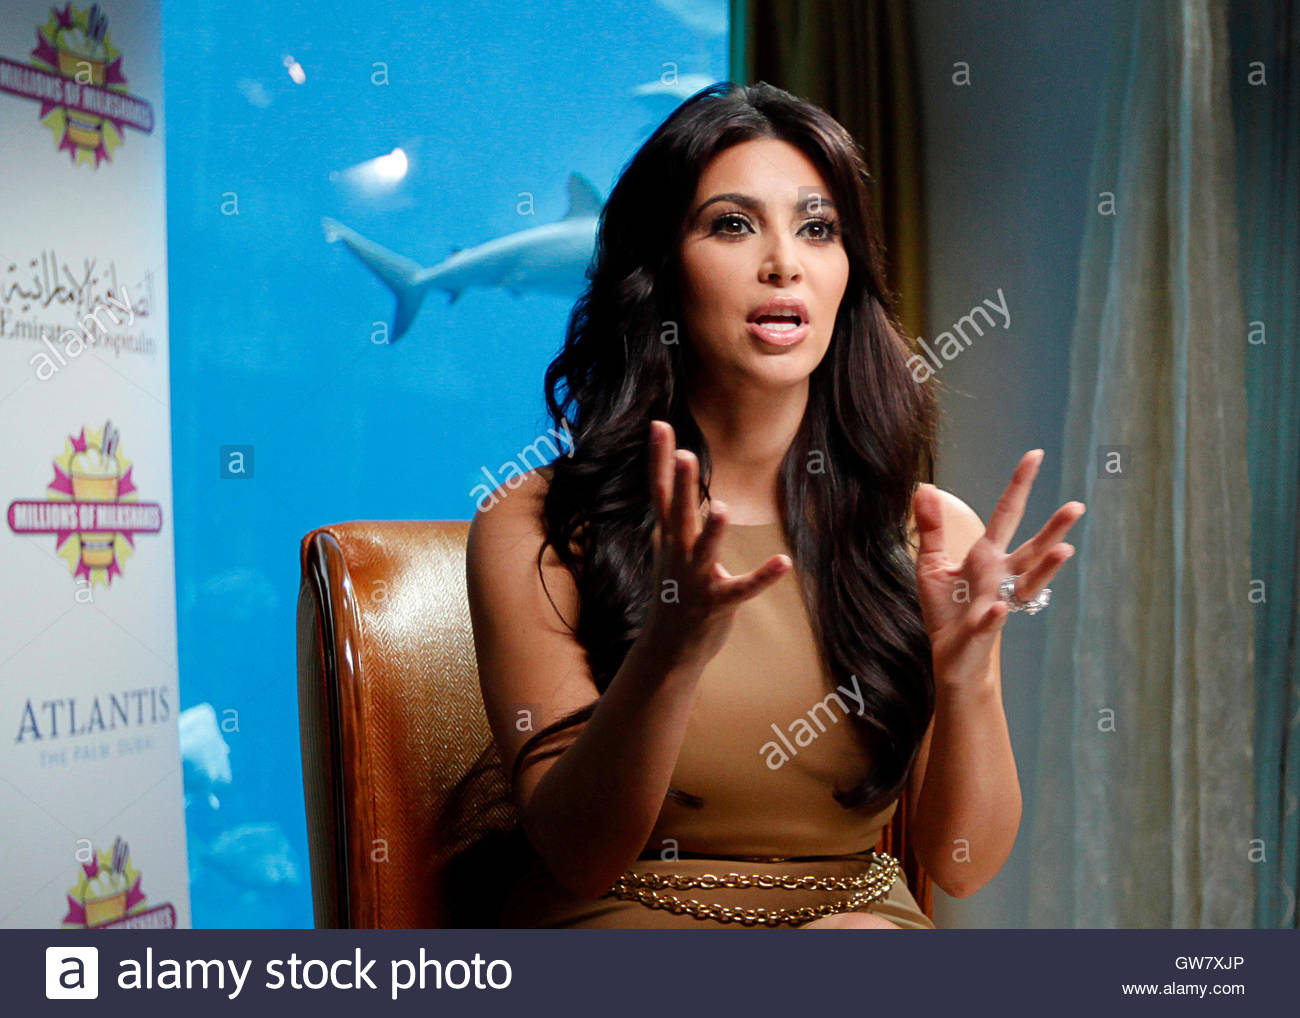 tv personality and actress kim kardashian speaks during an stock photo tv personality and actress kim kardashian speaks during an interview reuters in dubai 13 2011 kardashian is in the united arab